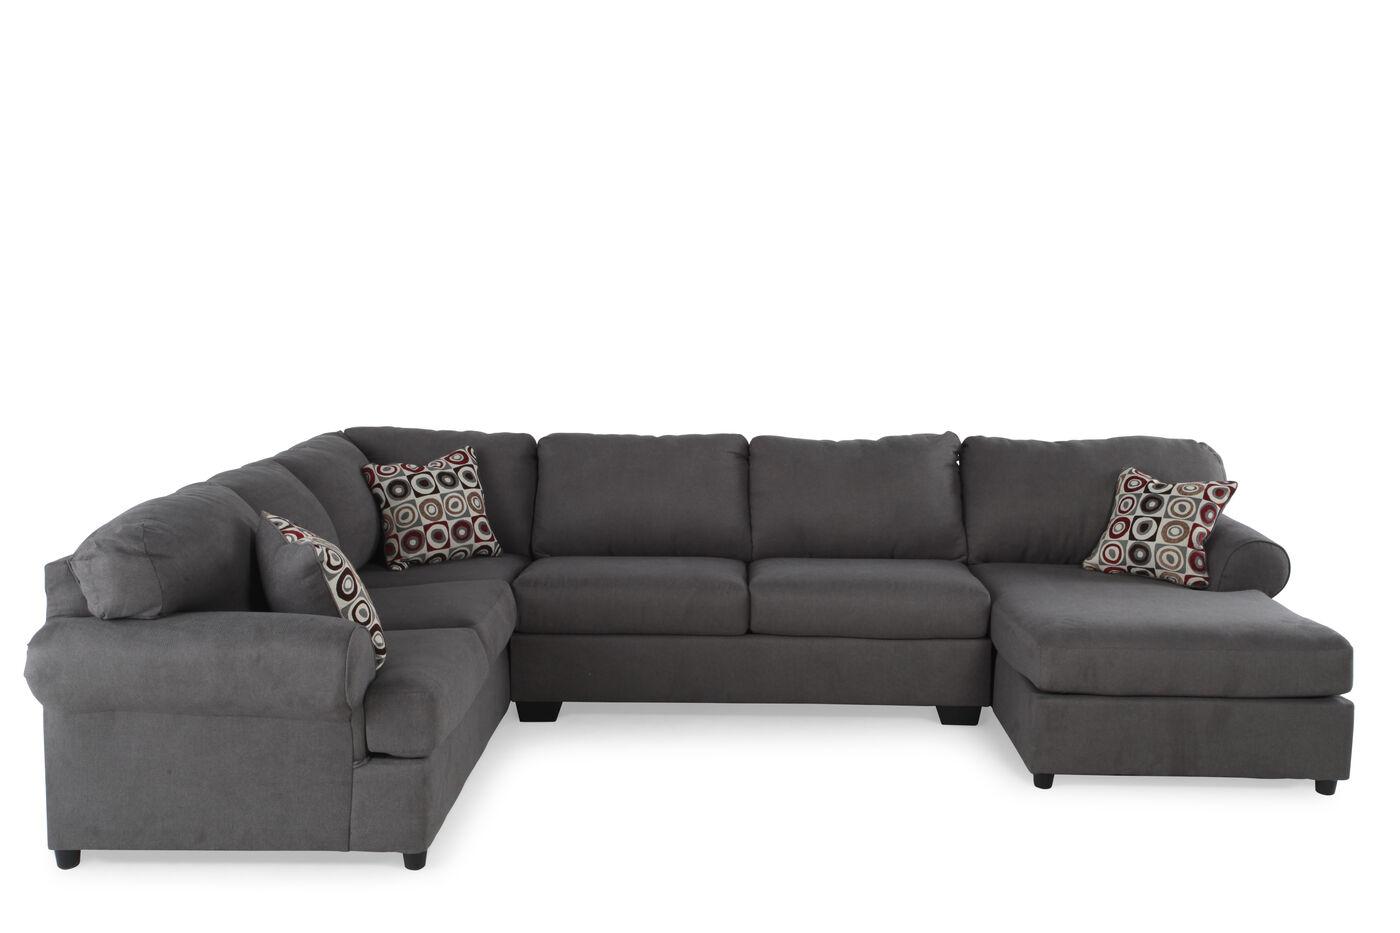 Three piece microfiber 93quot sectional in dark gray mathis for 3 piece microfiber recliner sectional sofa